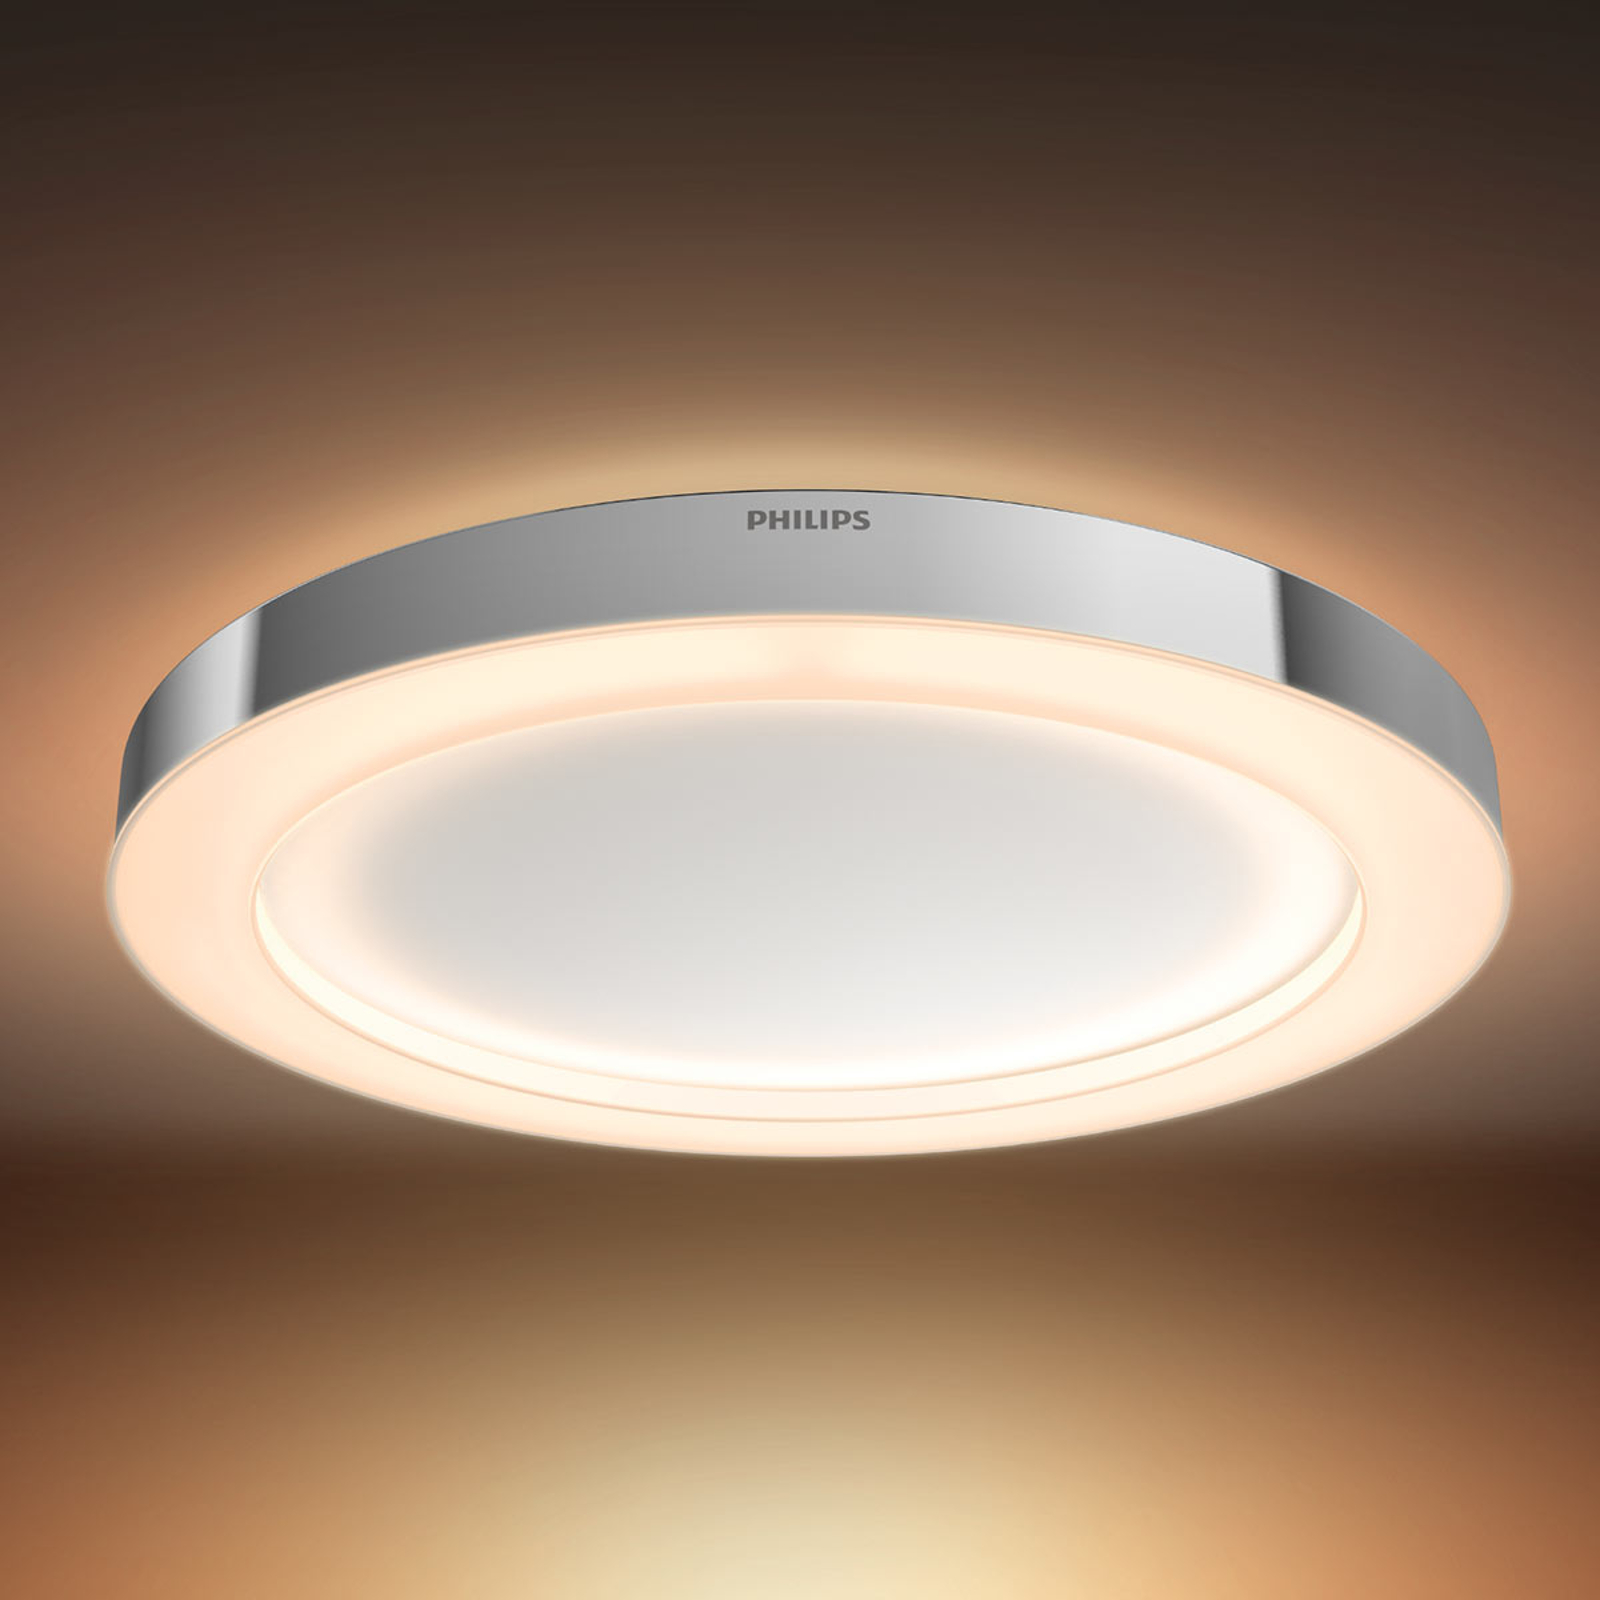 Philips Hue Adore Bathroom Ceiling Lamp Lights Co Uk